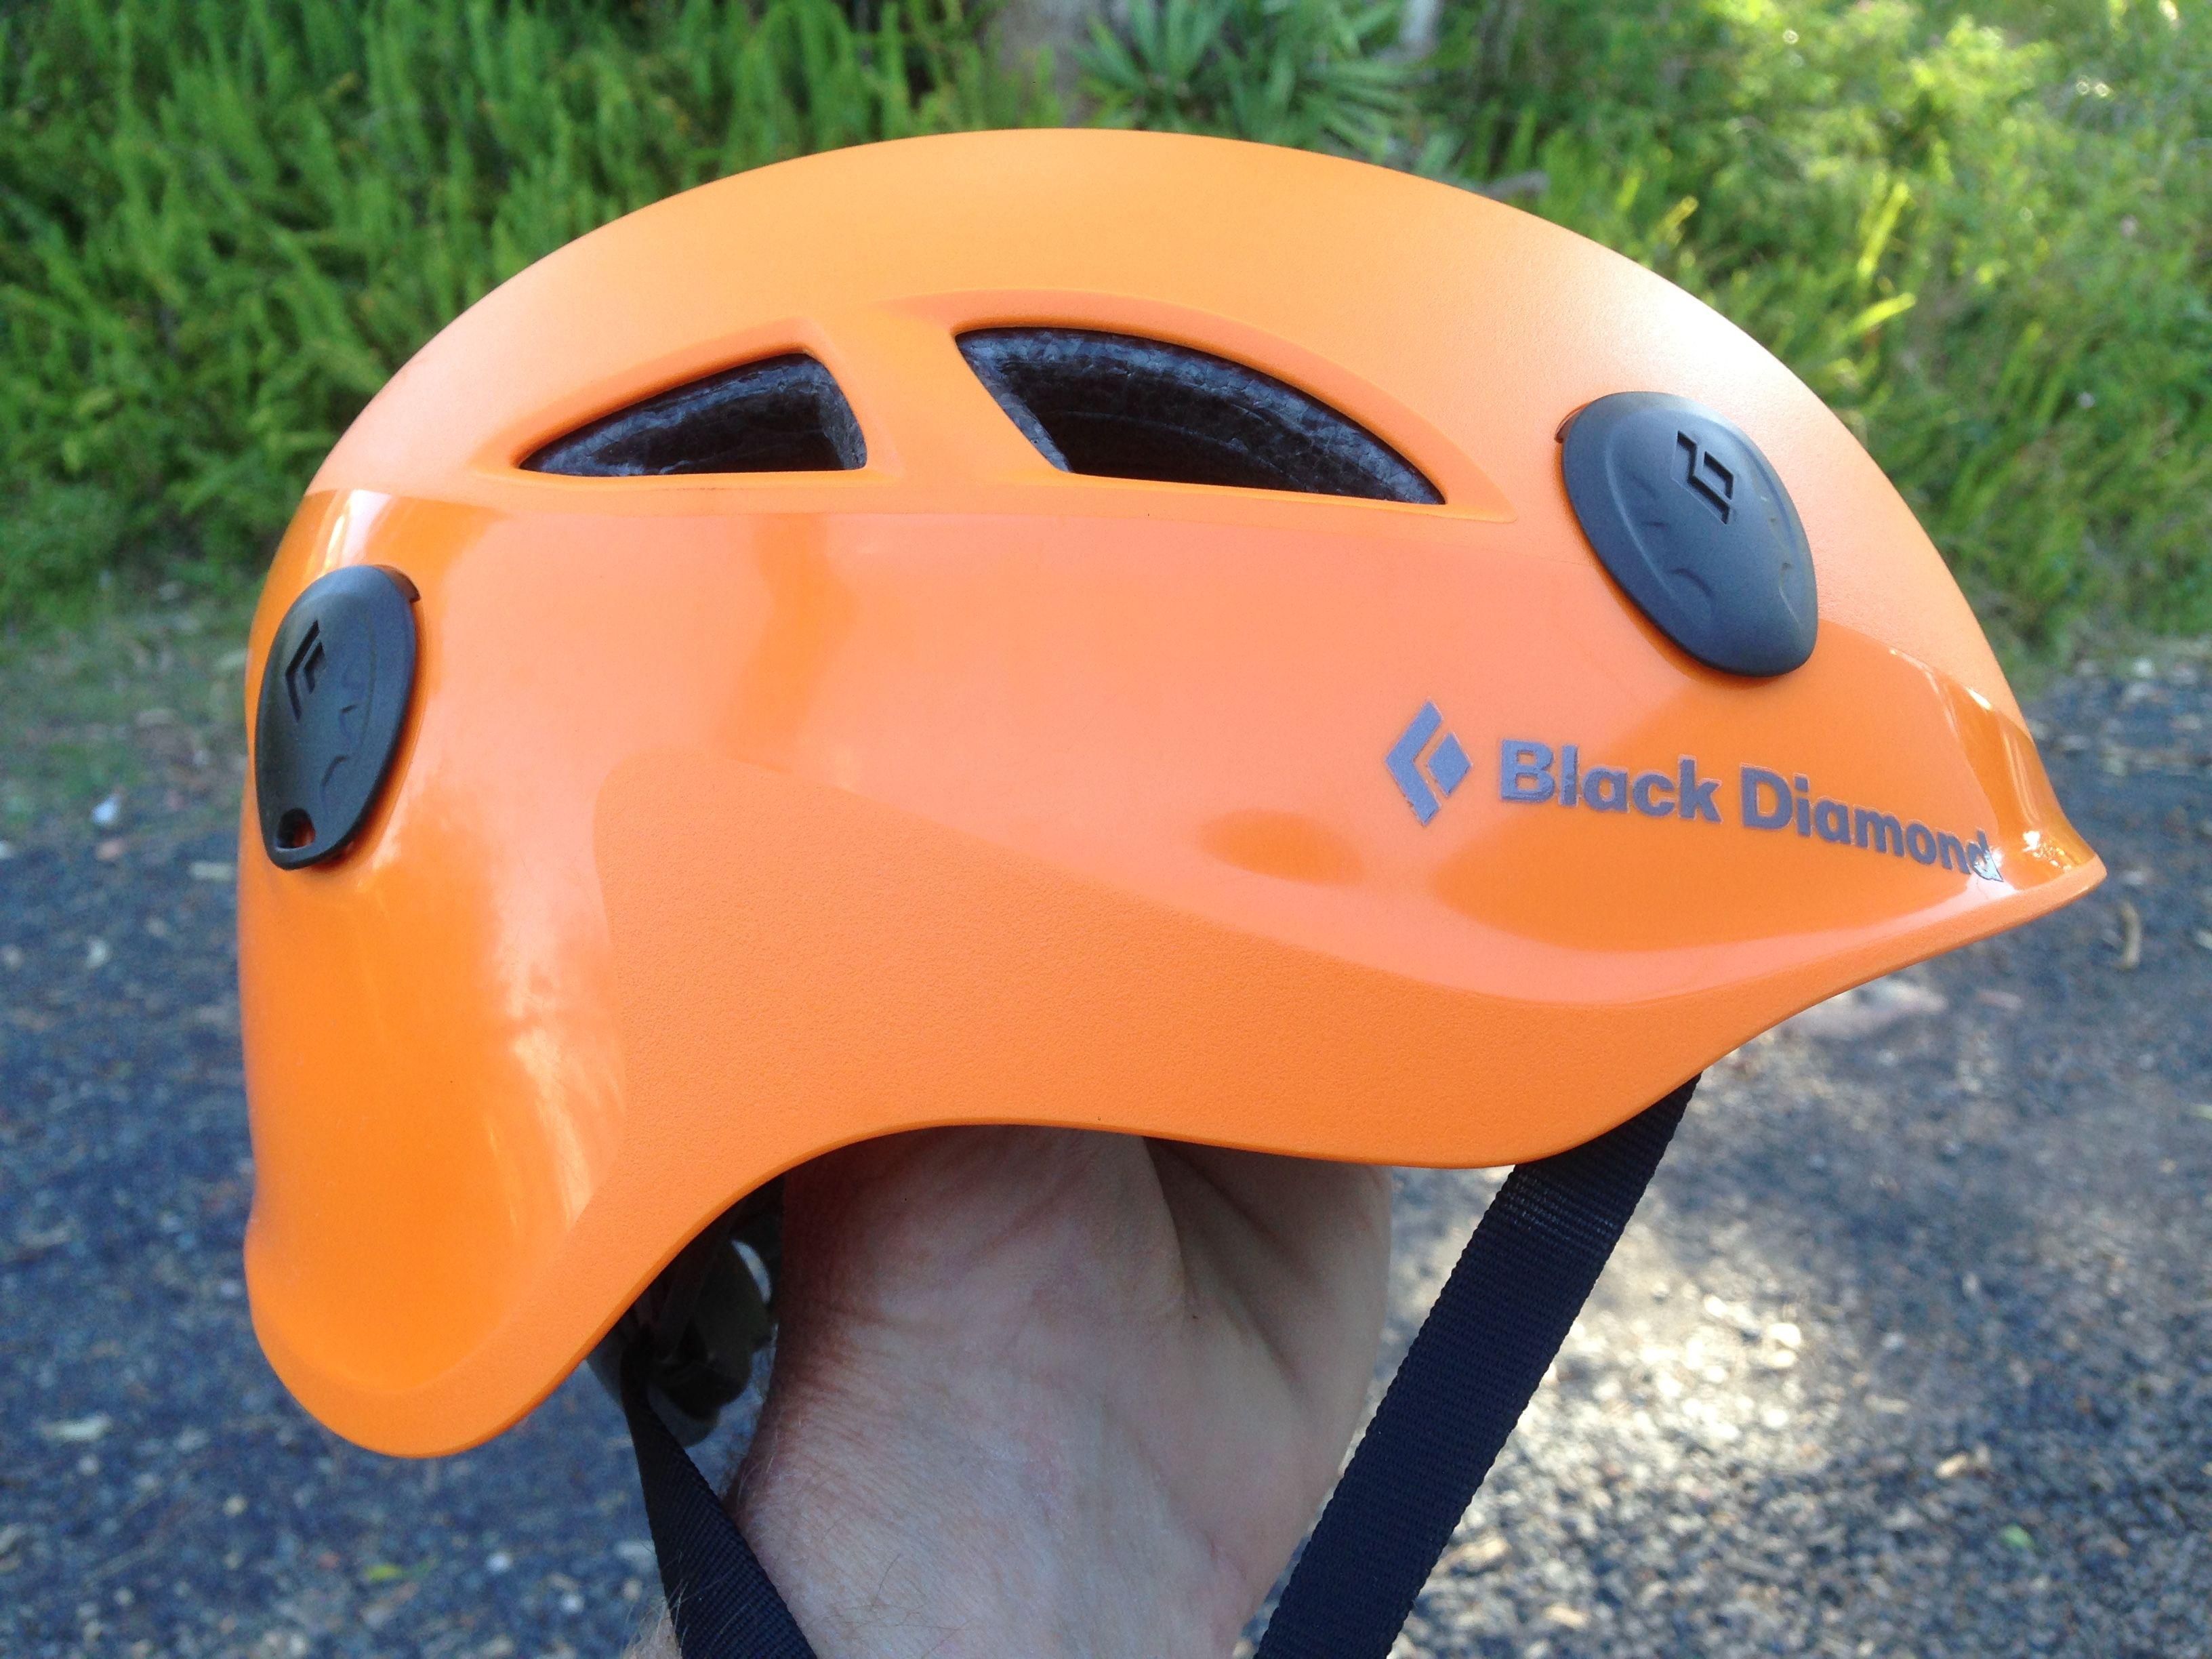 Black diamond climbing helmet body armour pinterest black diamonds